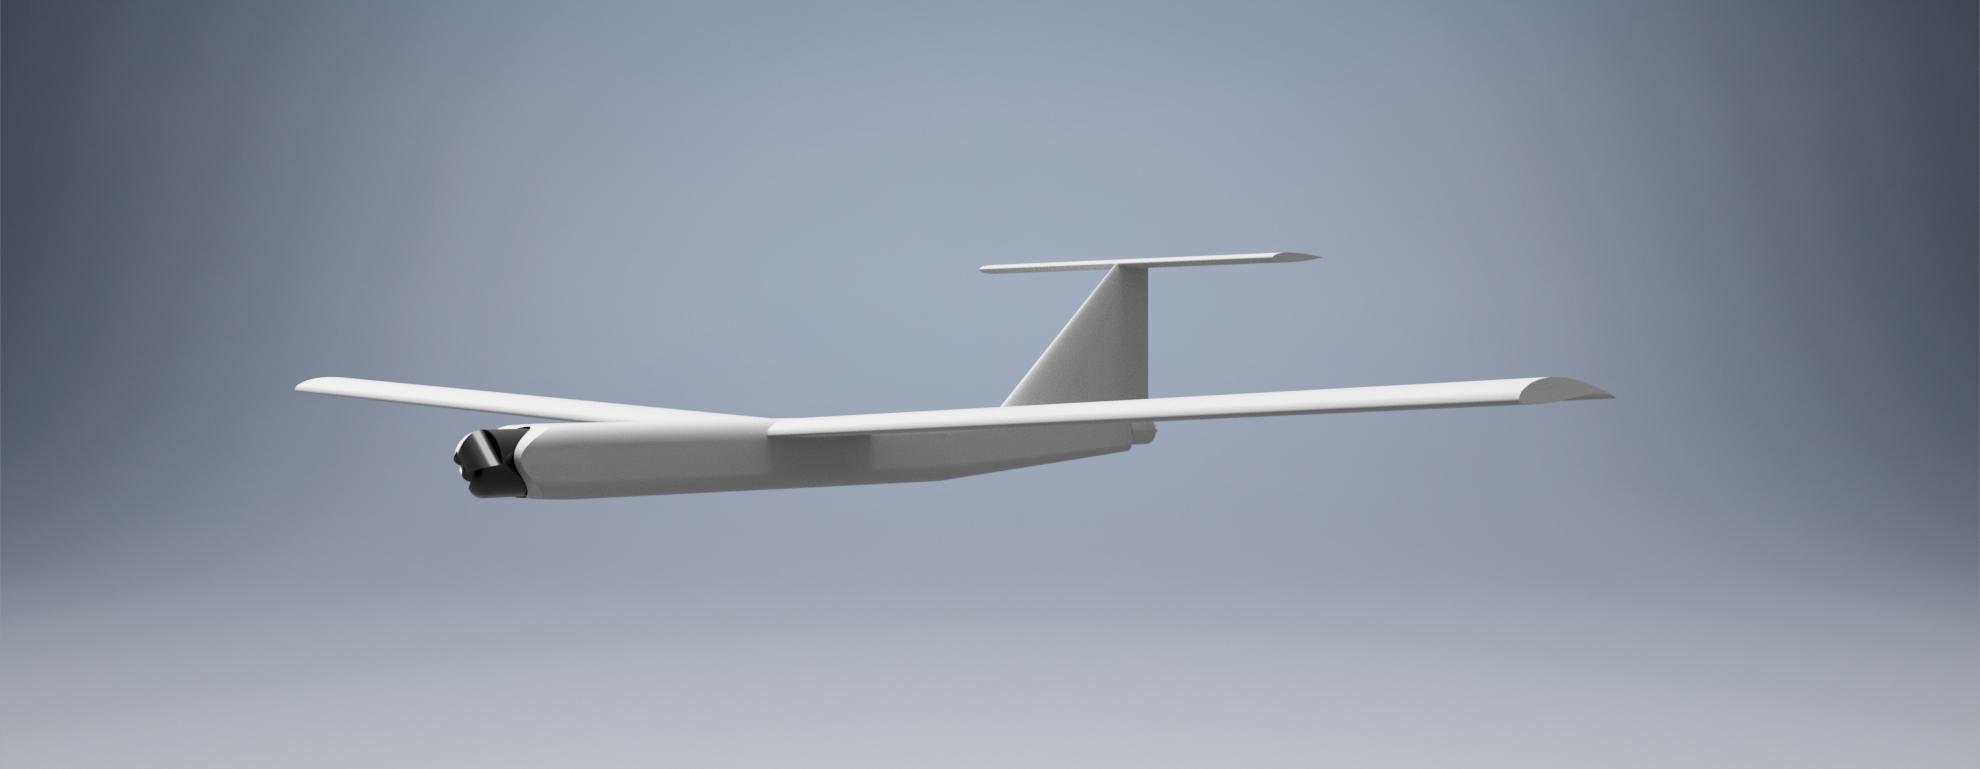 Eyercraft 2100 mini UAV details